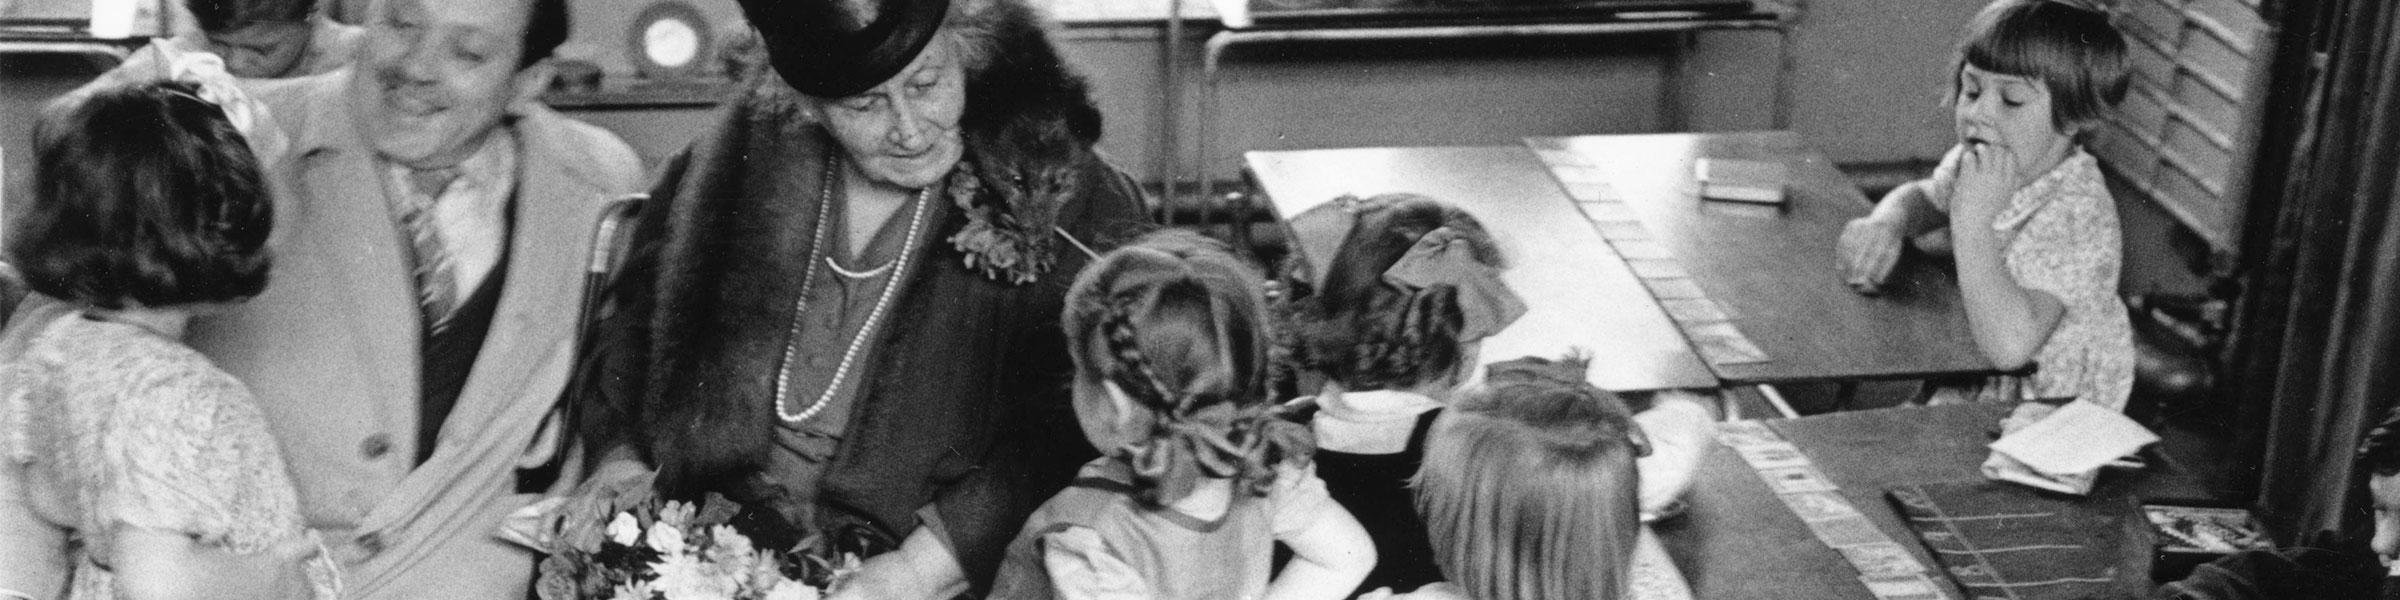 Maria and Mario Montessori with children